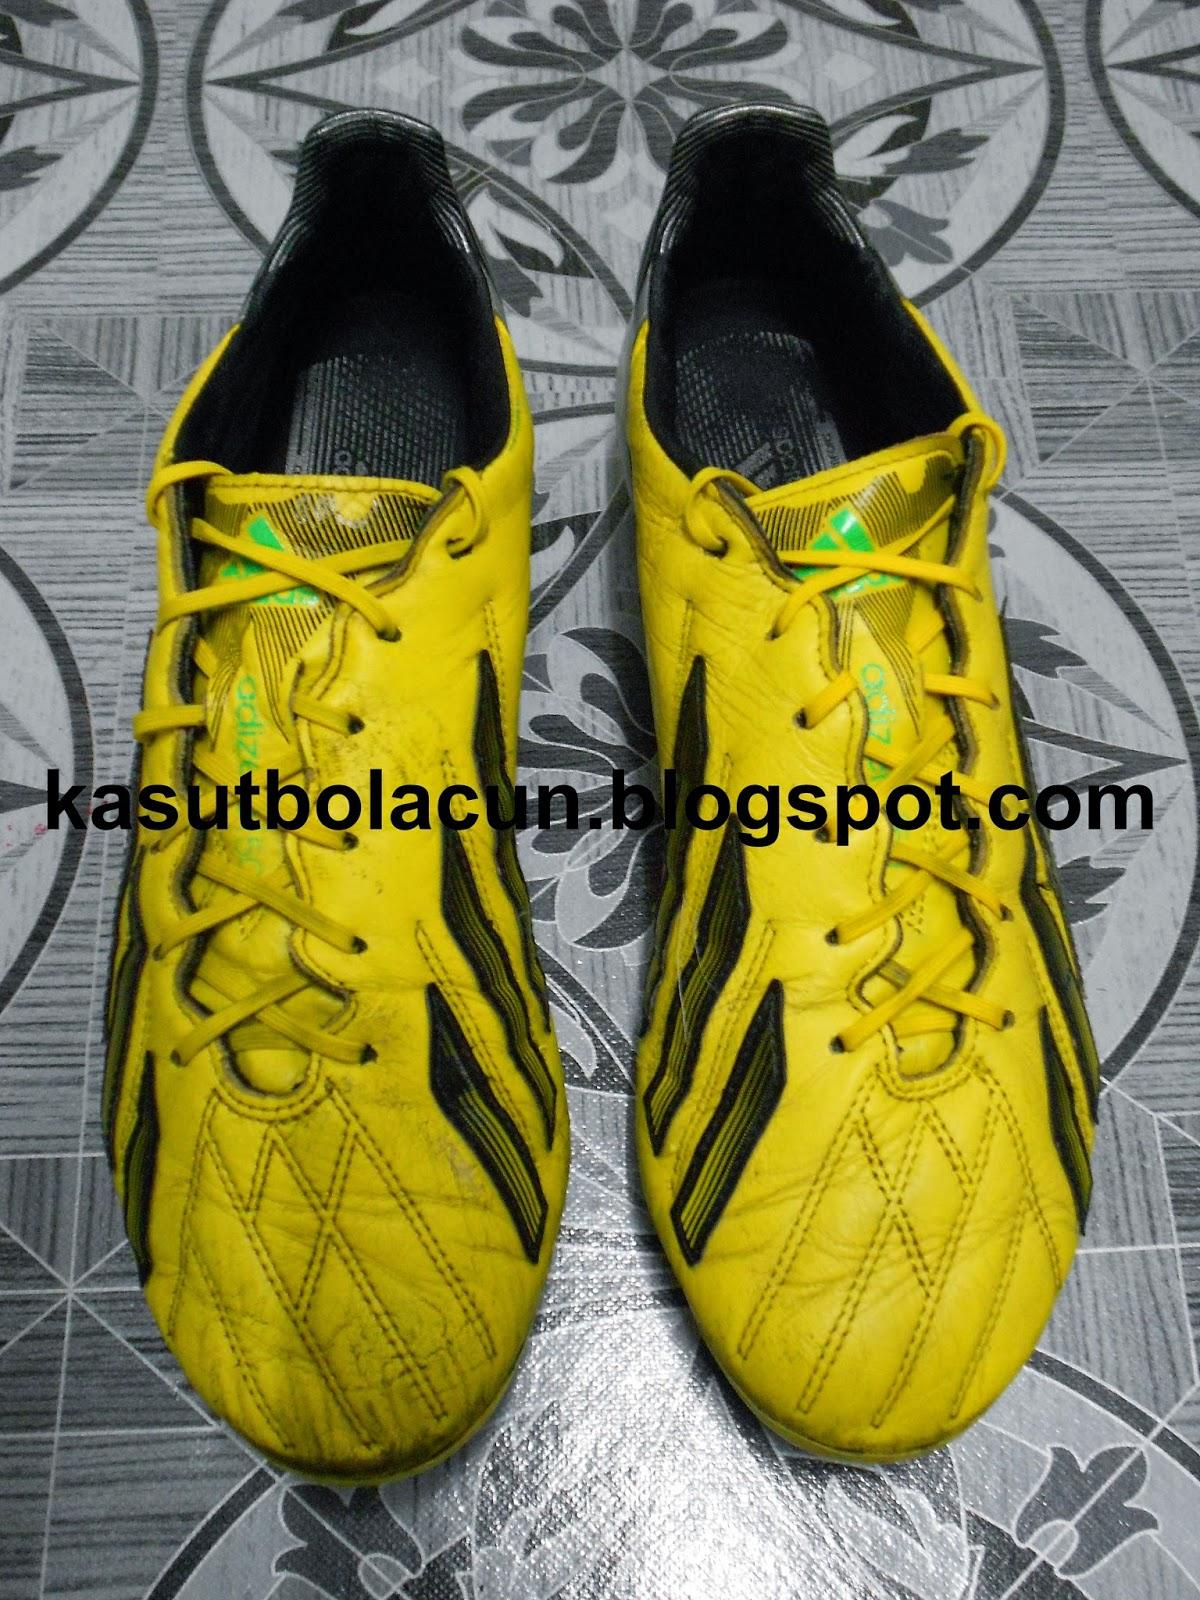 http://kasutbolacun.blogspot.com/2015/01/adidas-f50-adizero-micoach-2-fg-kuning_19.html